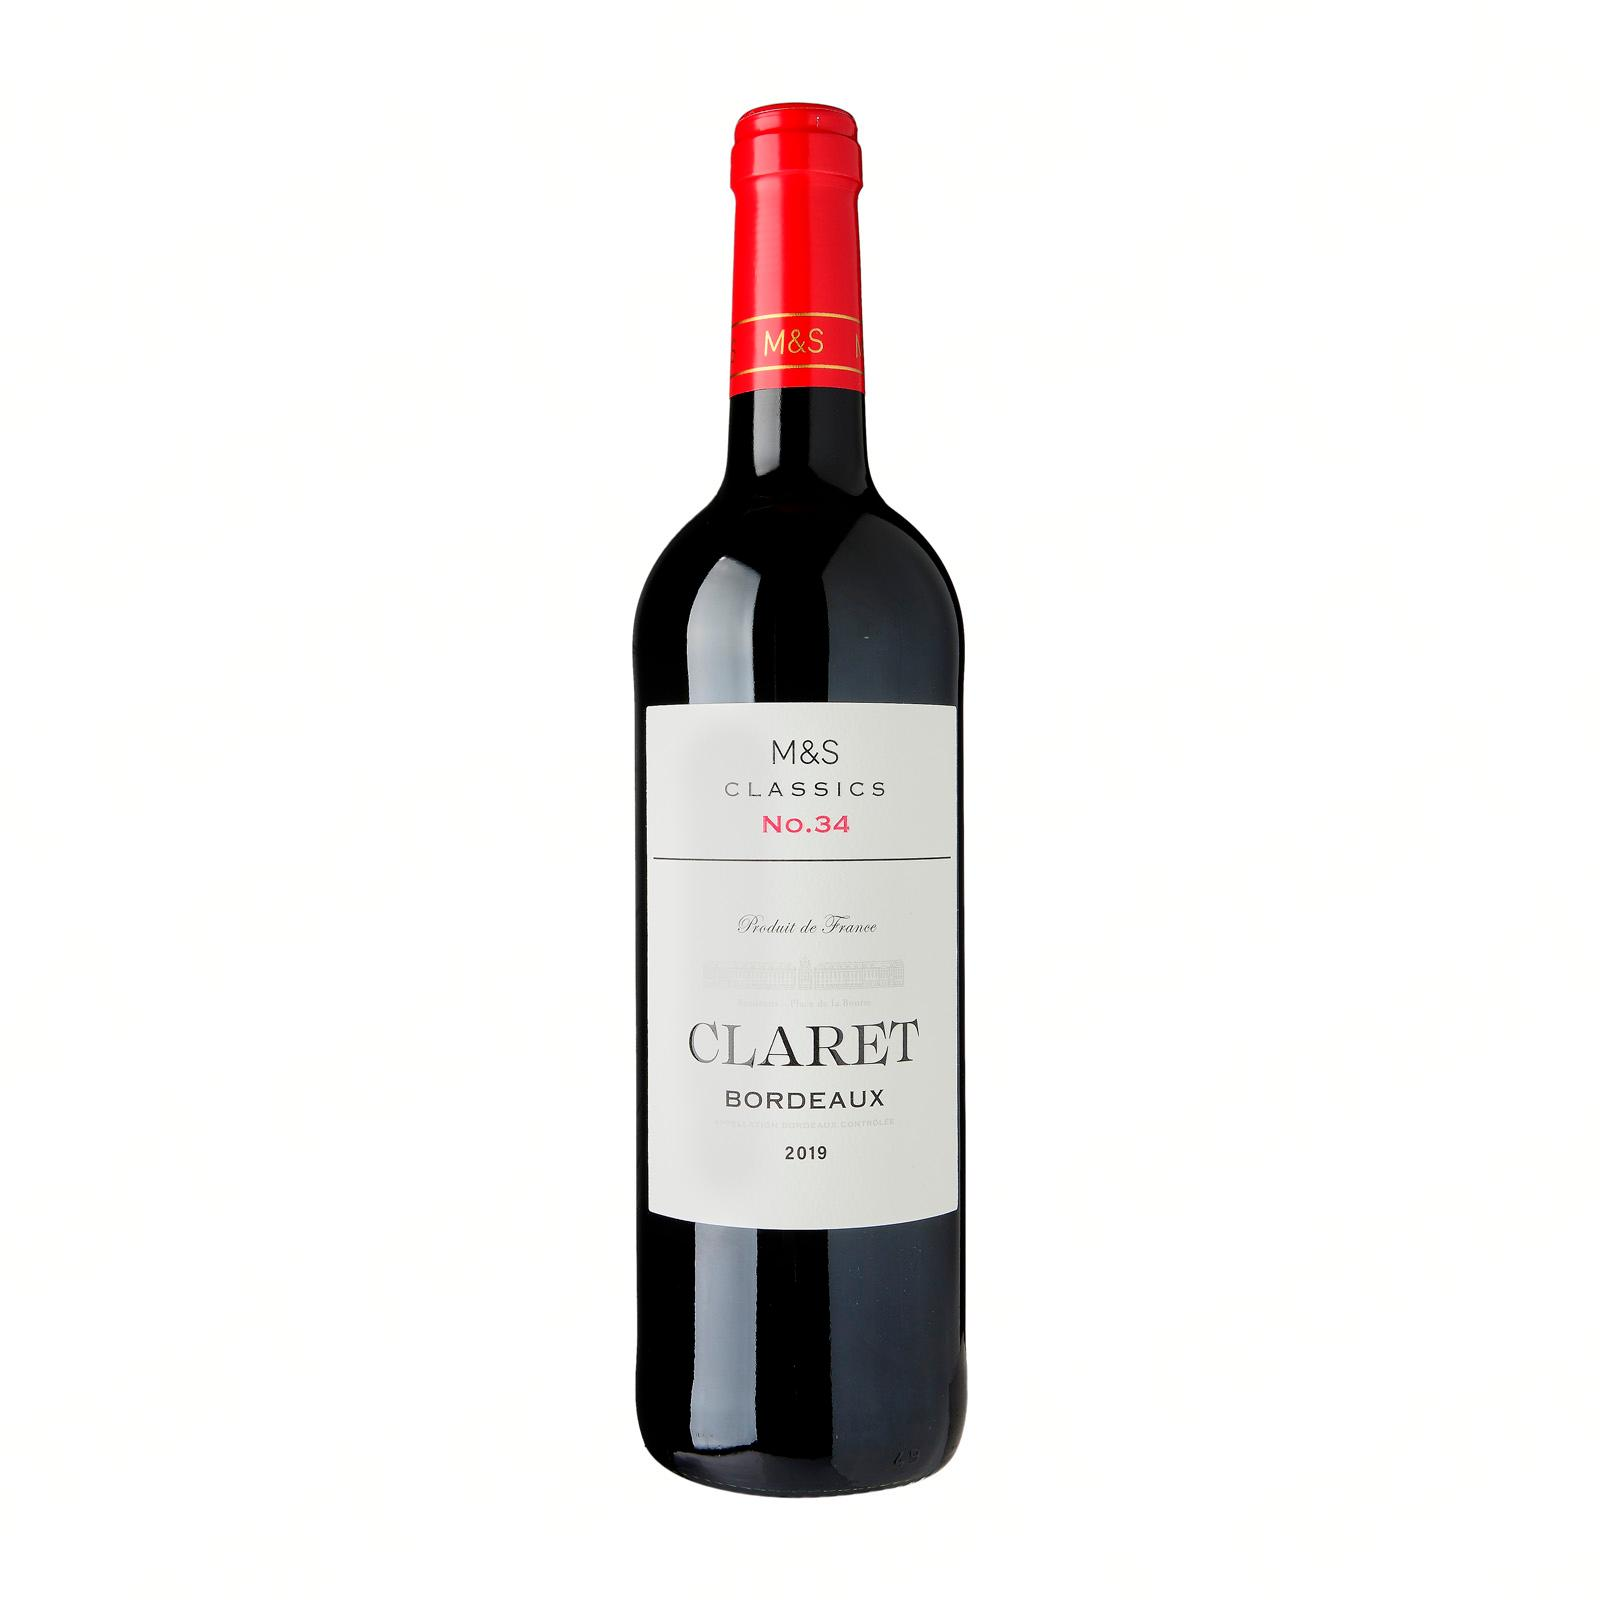 Marks & Spencer Classics Claret Bordeaux